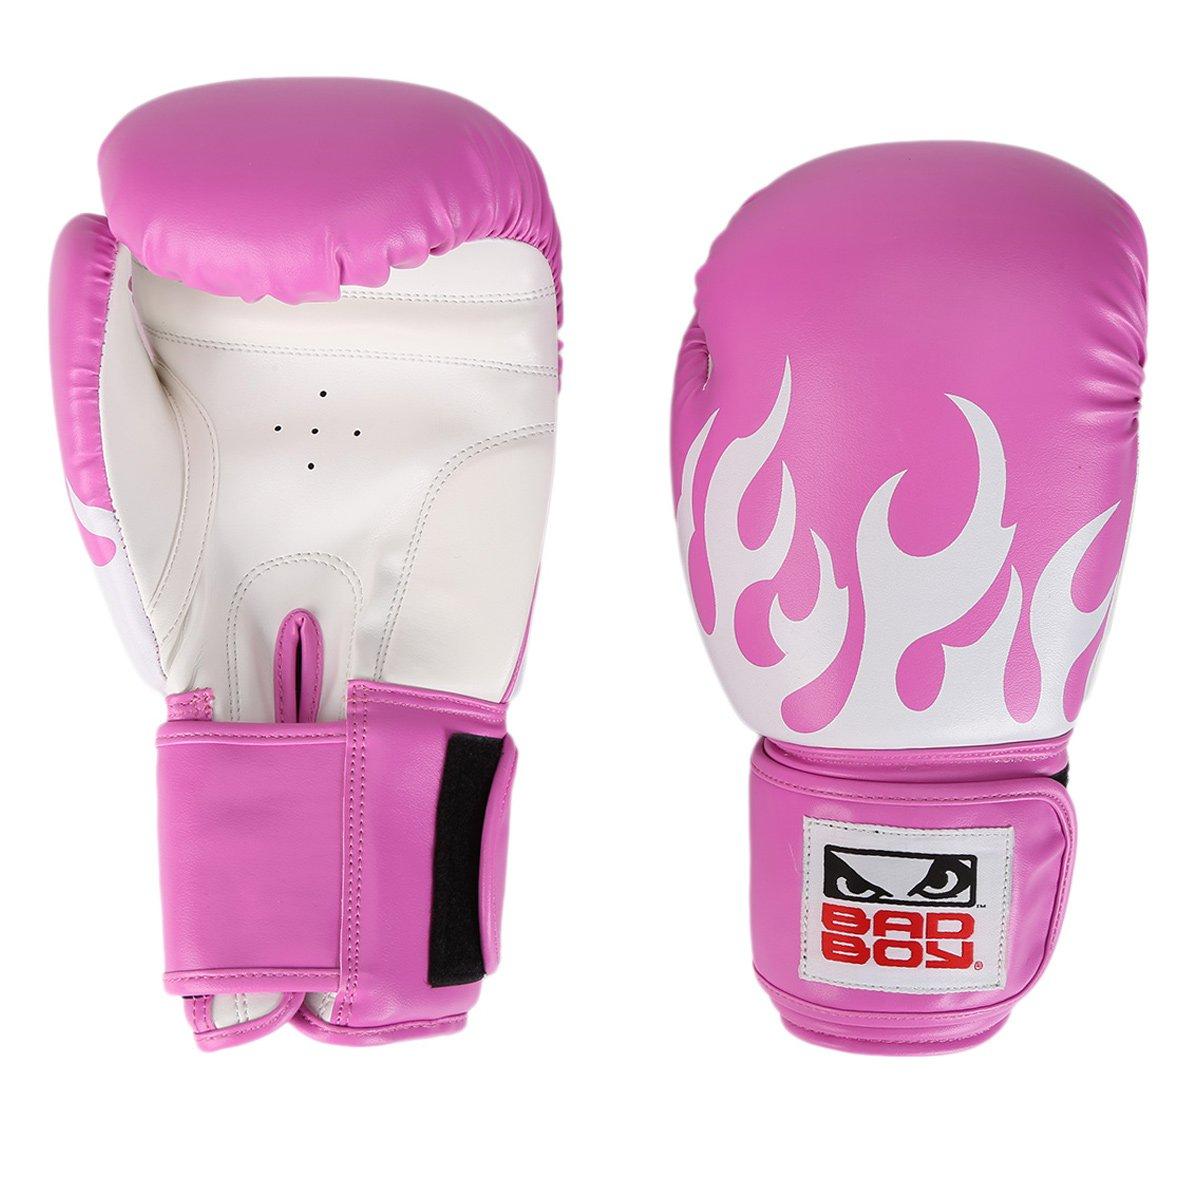 65038724a FornecedorNetshoes. Luva de Boxe Muay Thai Feminina Treino Bad Boy 12 OZ